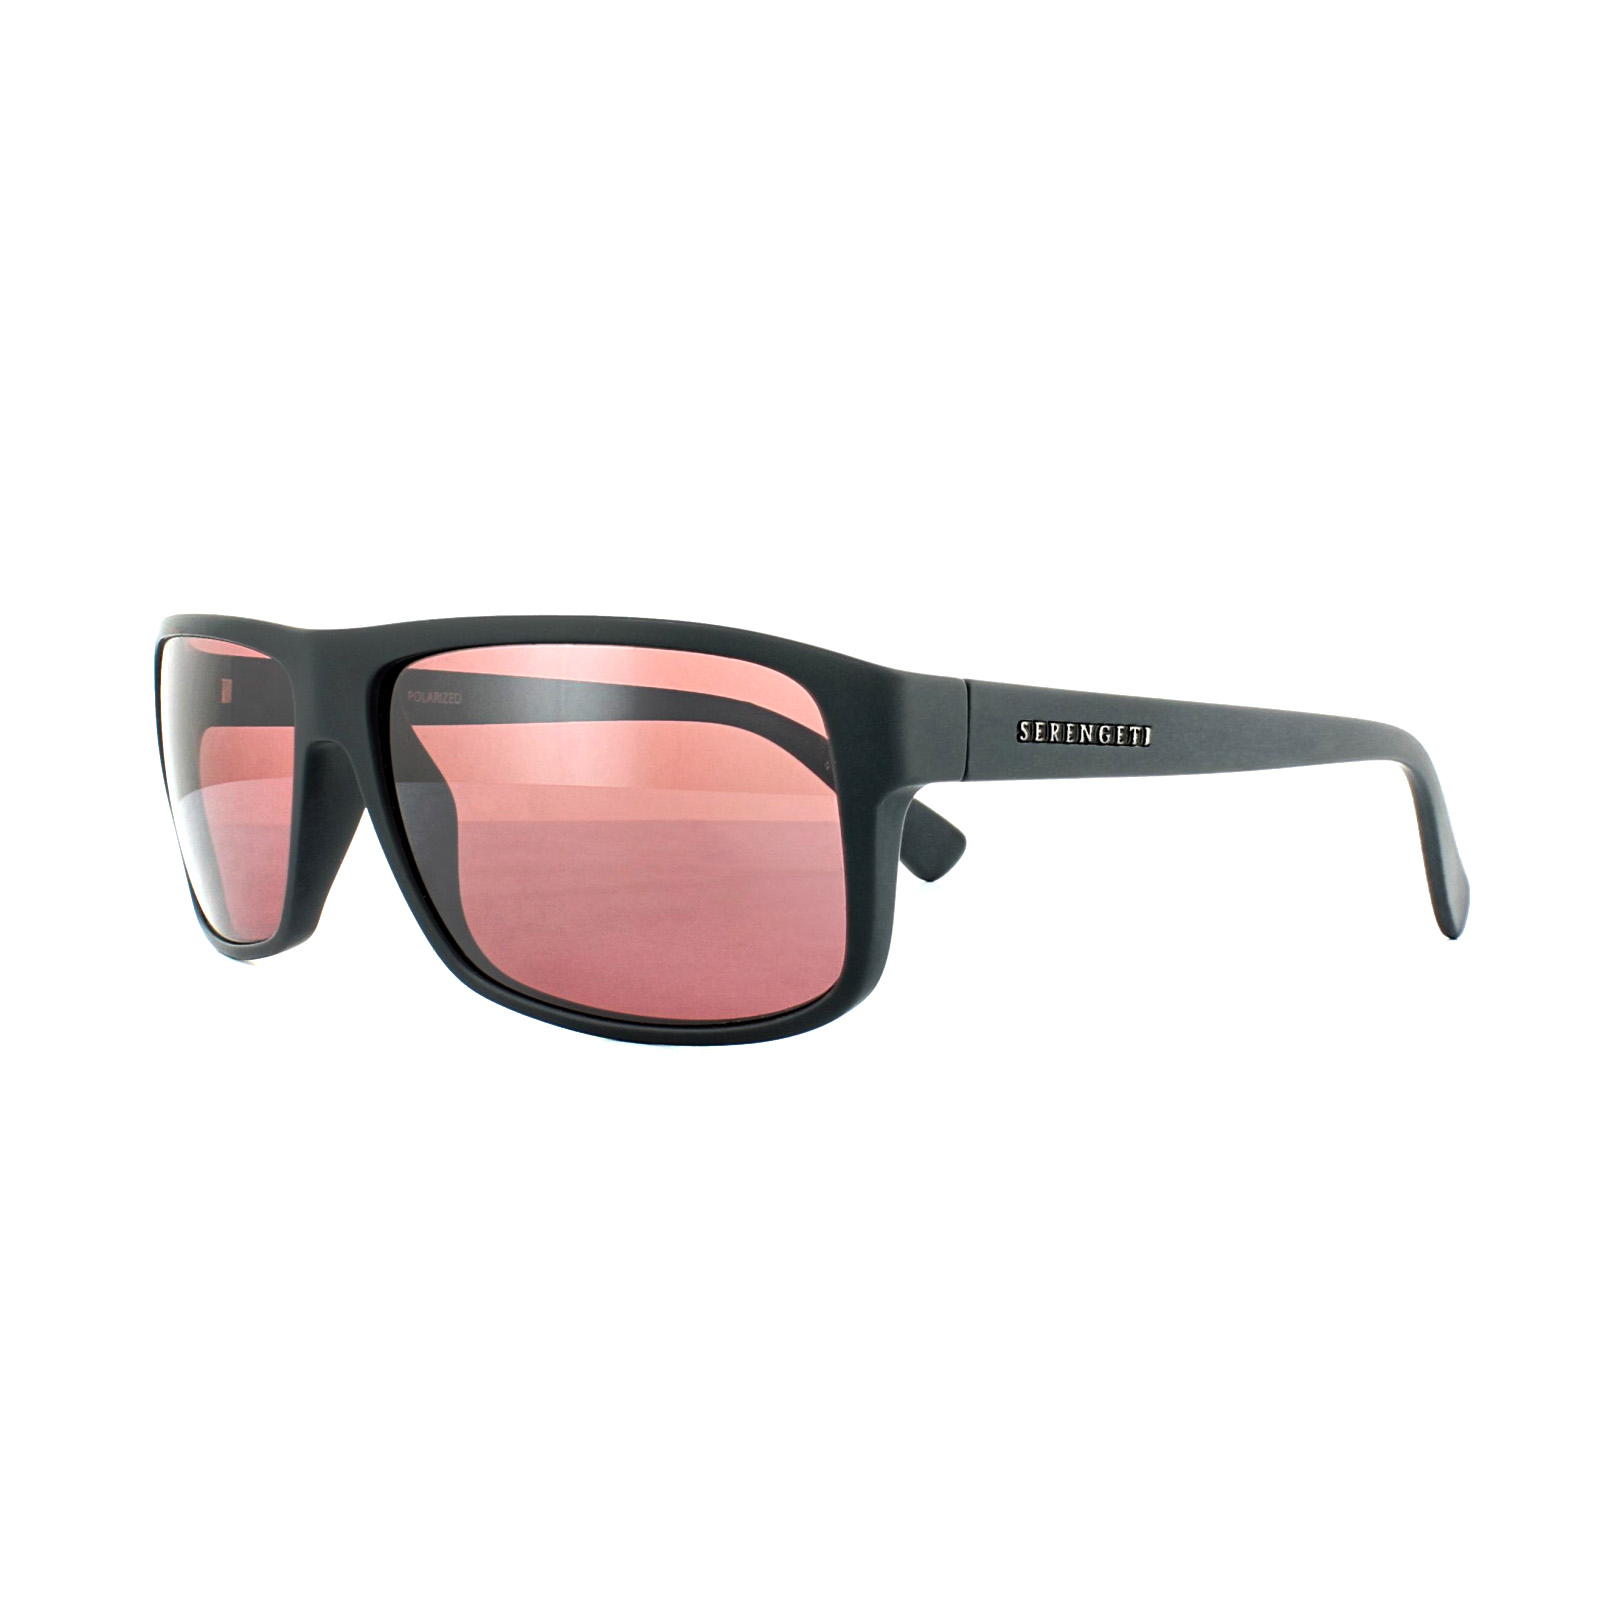 b44ce86771 Sentinel Serengeti Sunglasses Claudio 8087 Satin Dark Grey Sedona Pink  Polarized